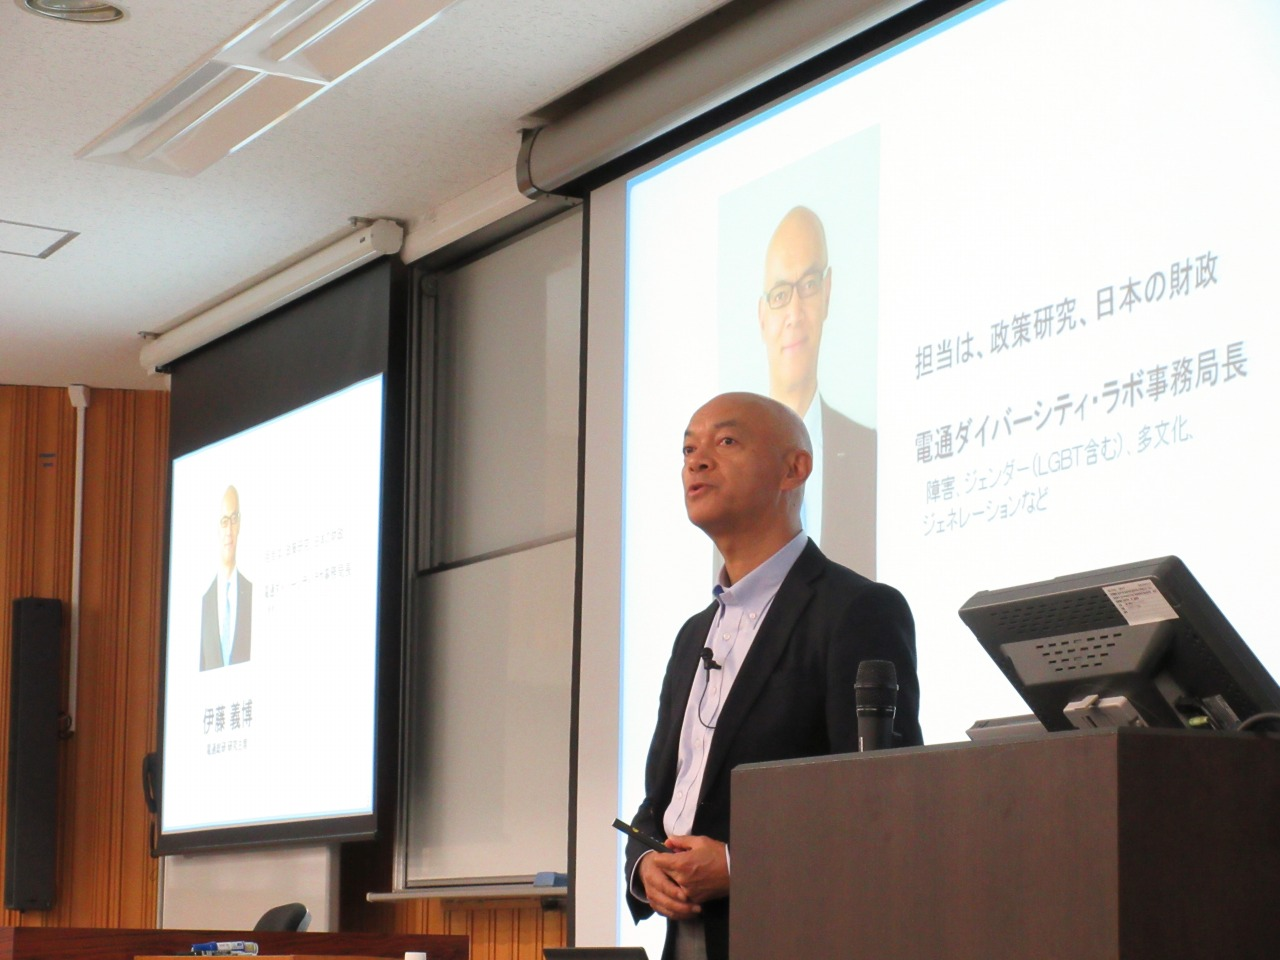 http://www.shinshu-u.ac.jp/faculty/econlaw/topics/images/s-IMG_0938.jpg